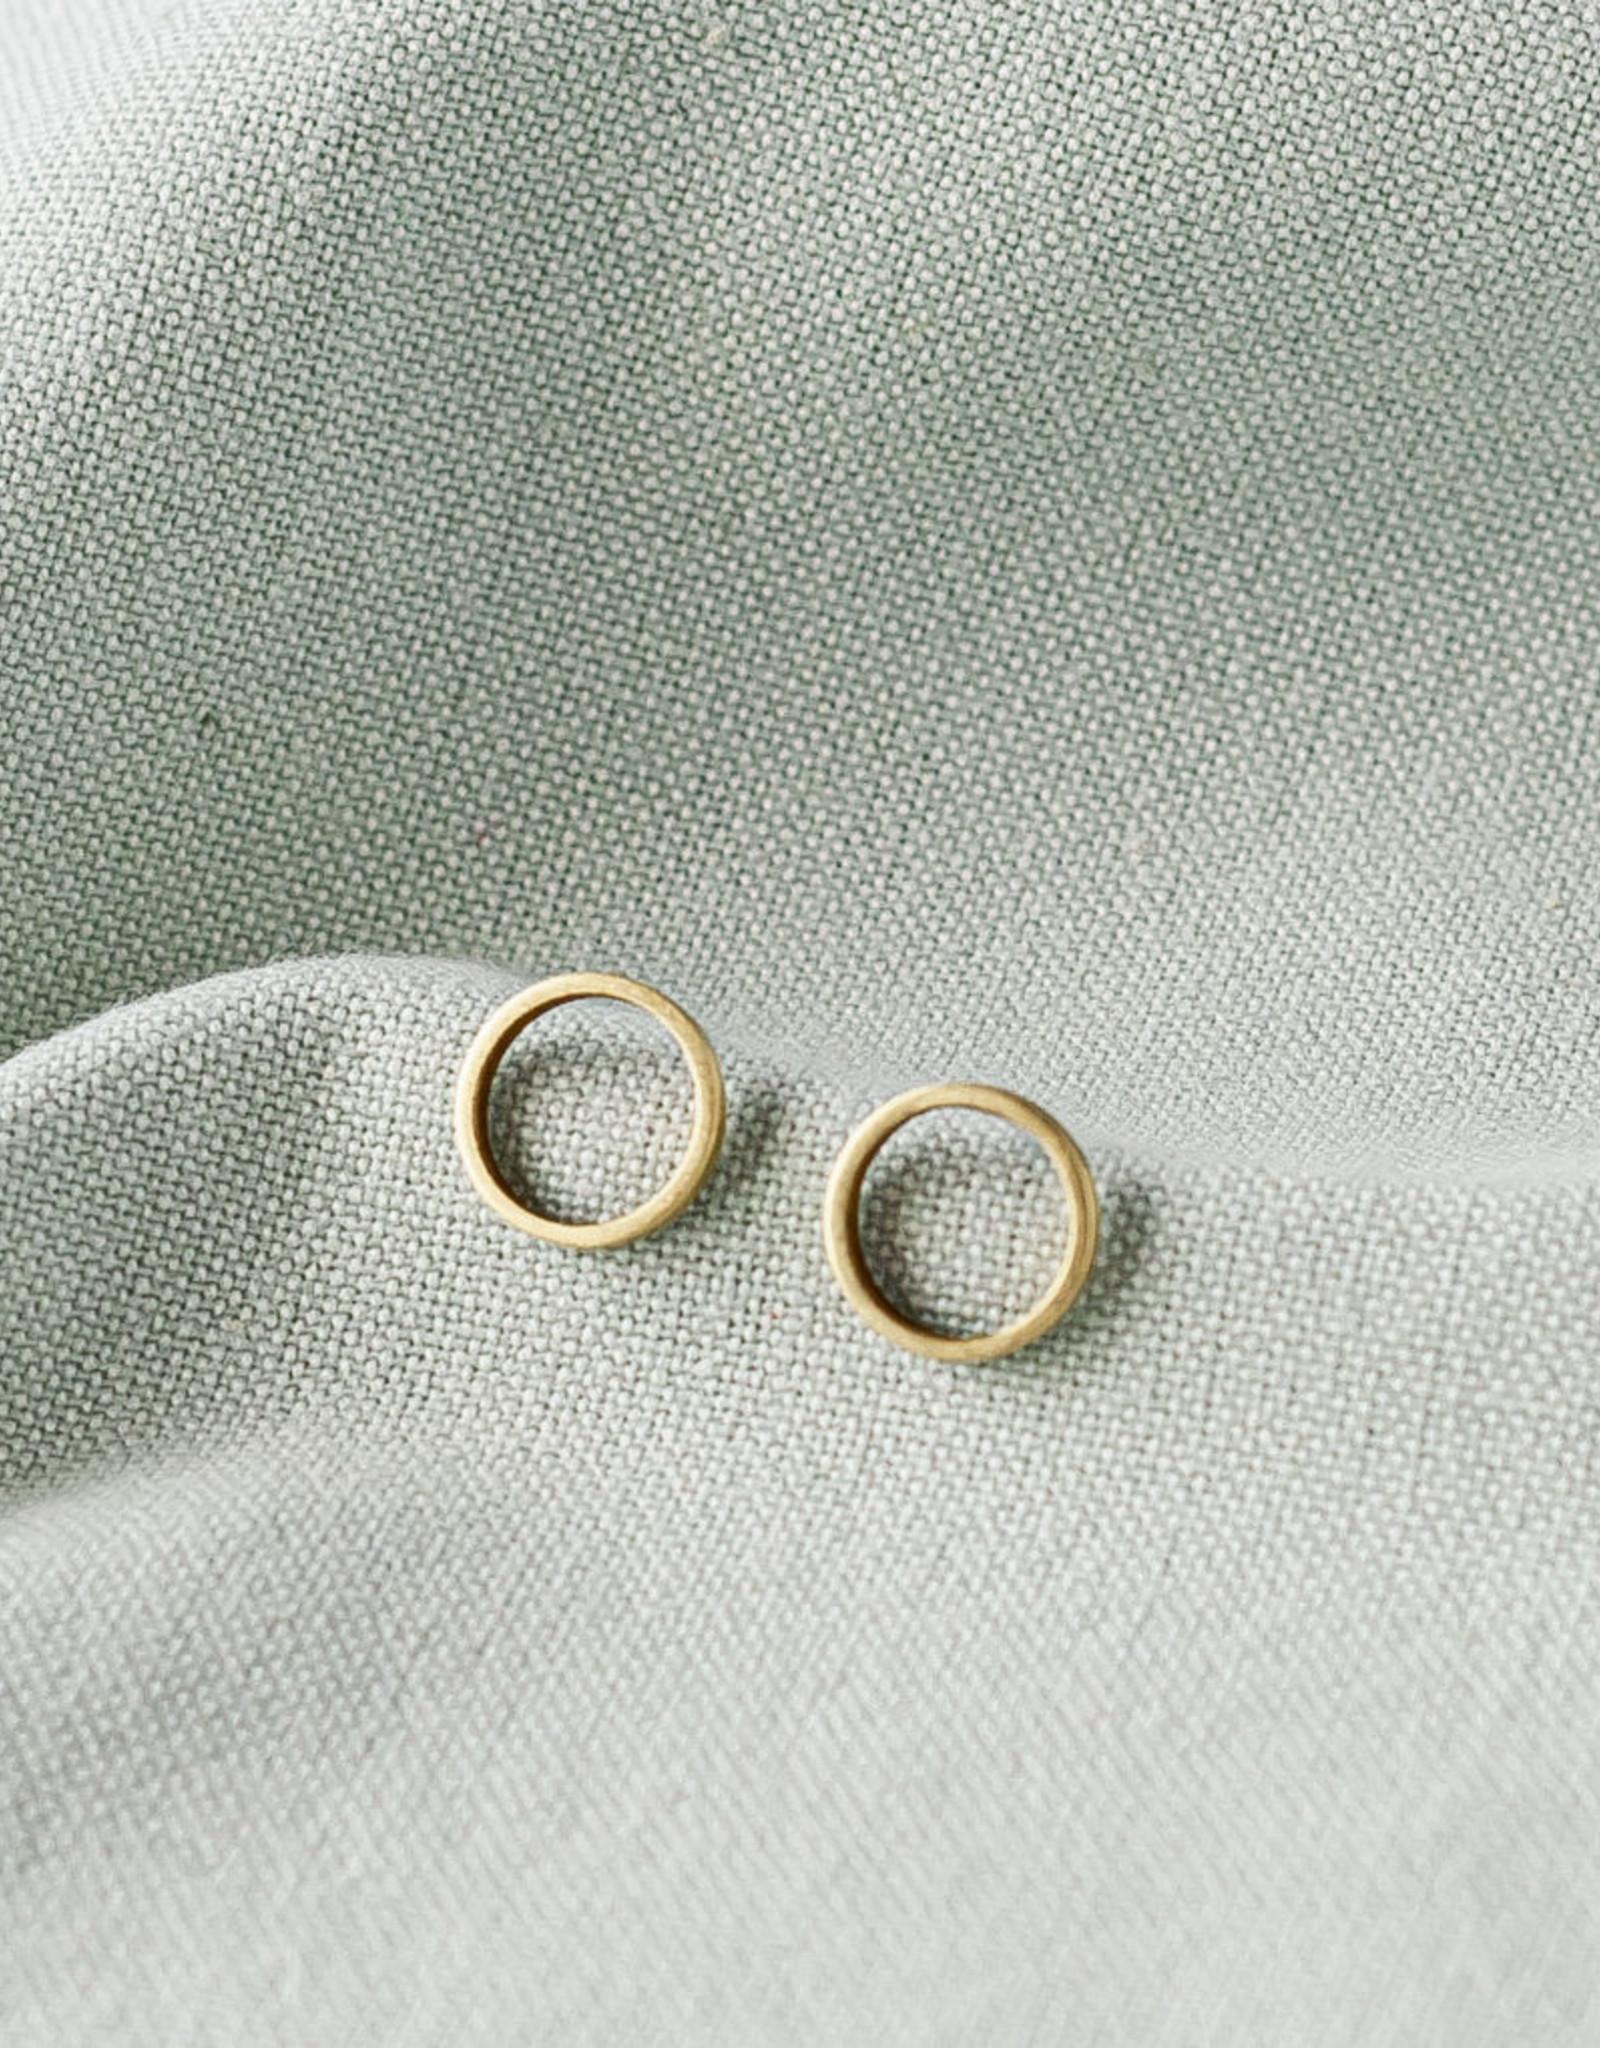 Iniminihomemade Oorbellen Brass Dot Open Studs 12mm-gold